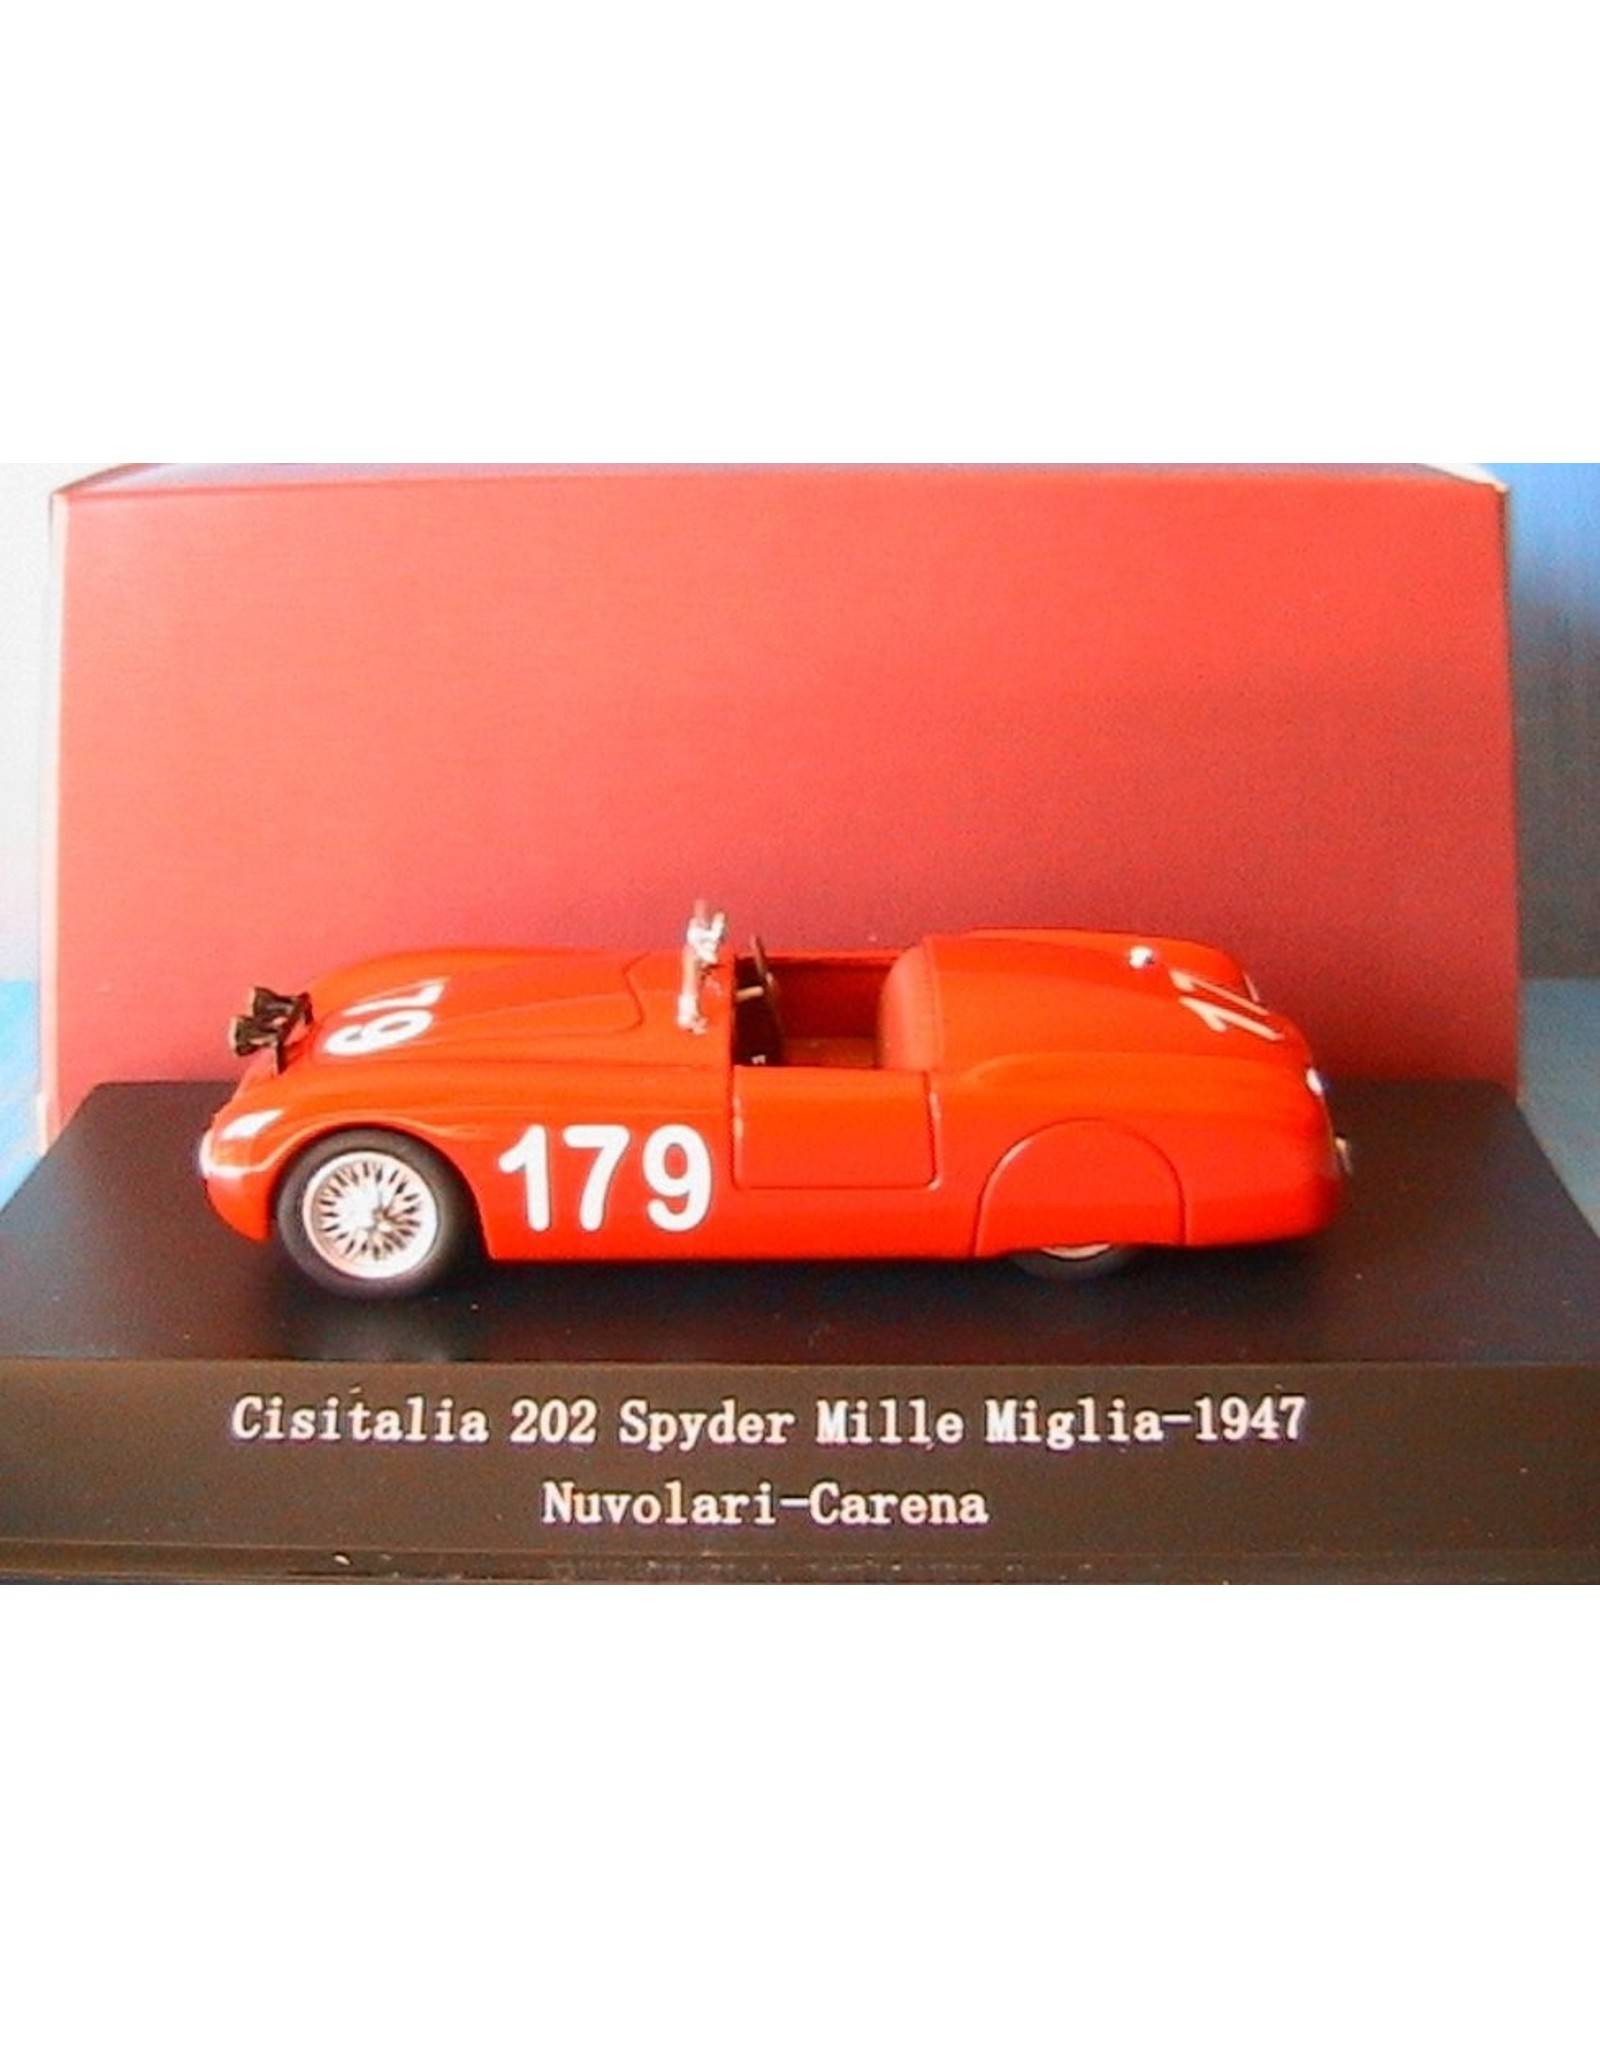 Cisitalia CISITALIA 202 SPYDER MILLE MIGLIA-1947(Nuvolari-Carena)#179.